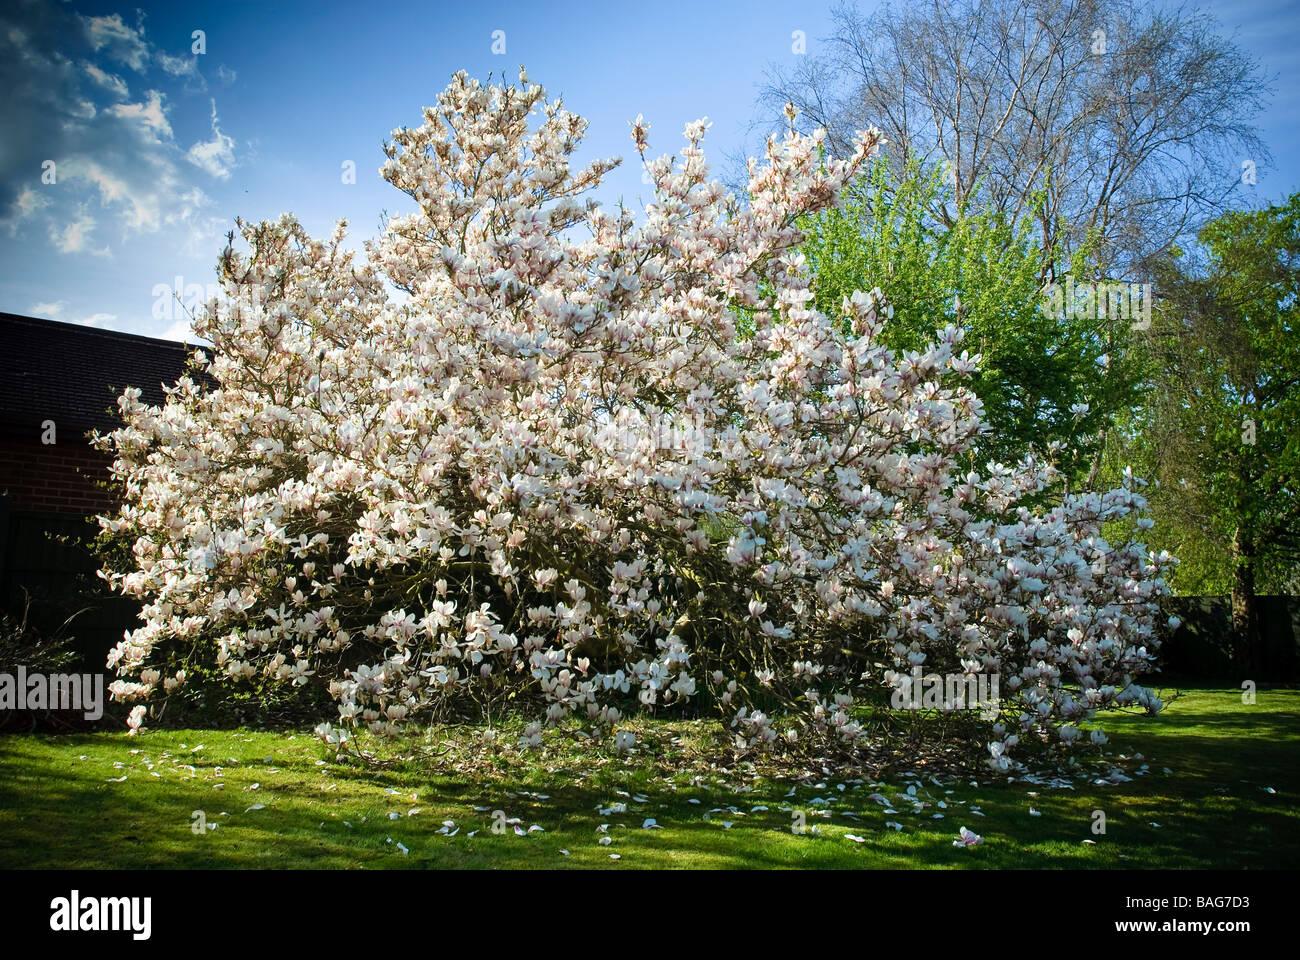 Magnolia Tree In Full Bloom Stock Photos Magnolia Tree In Full